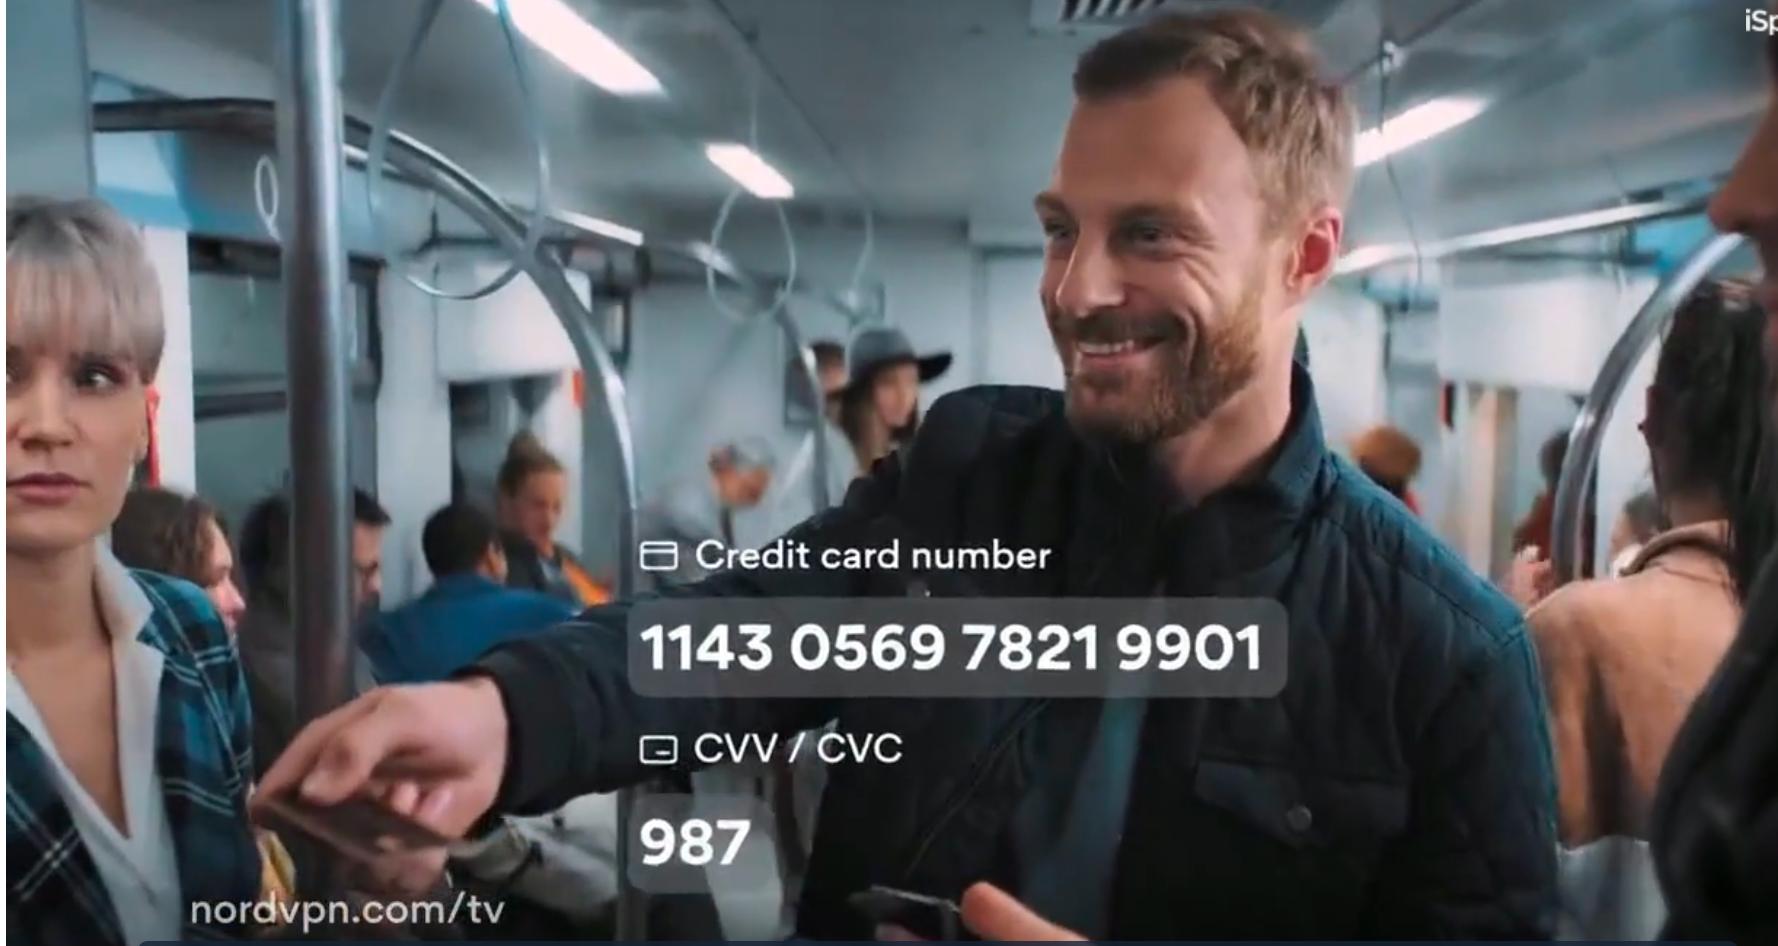 nordvpn credit card theft on subway underground